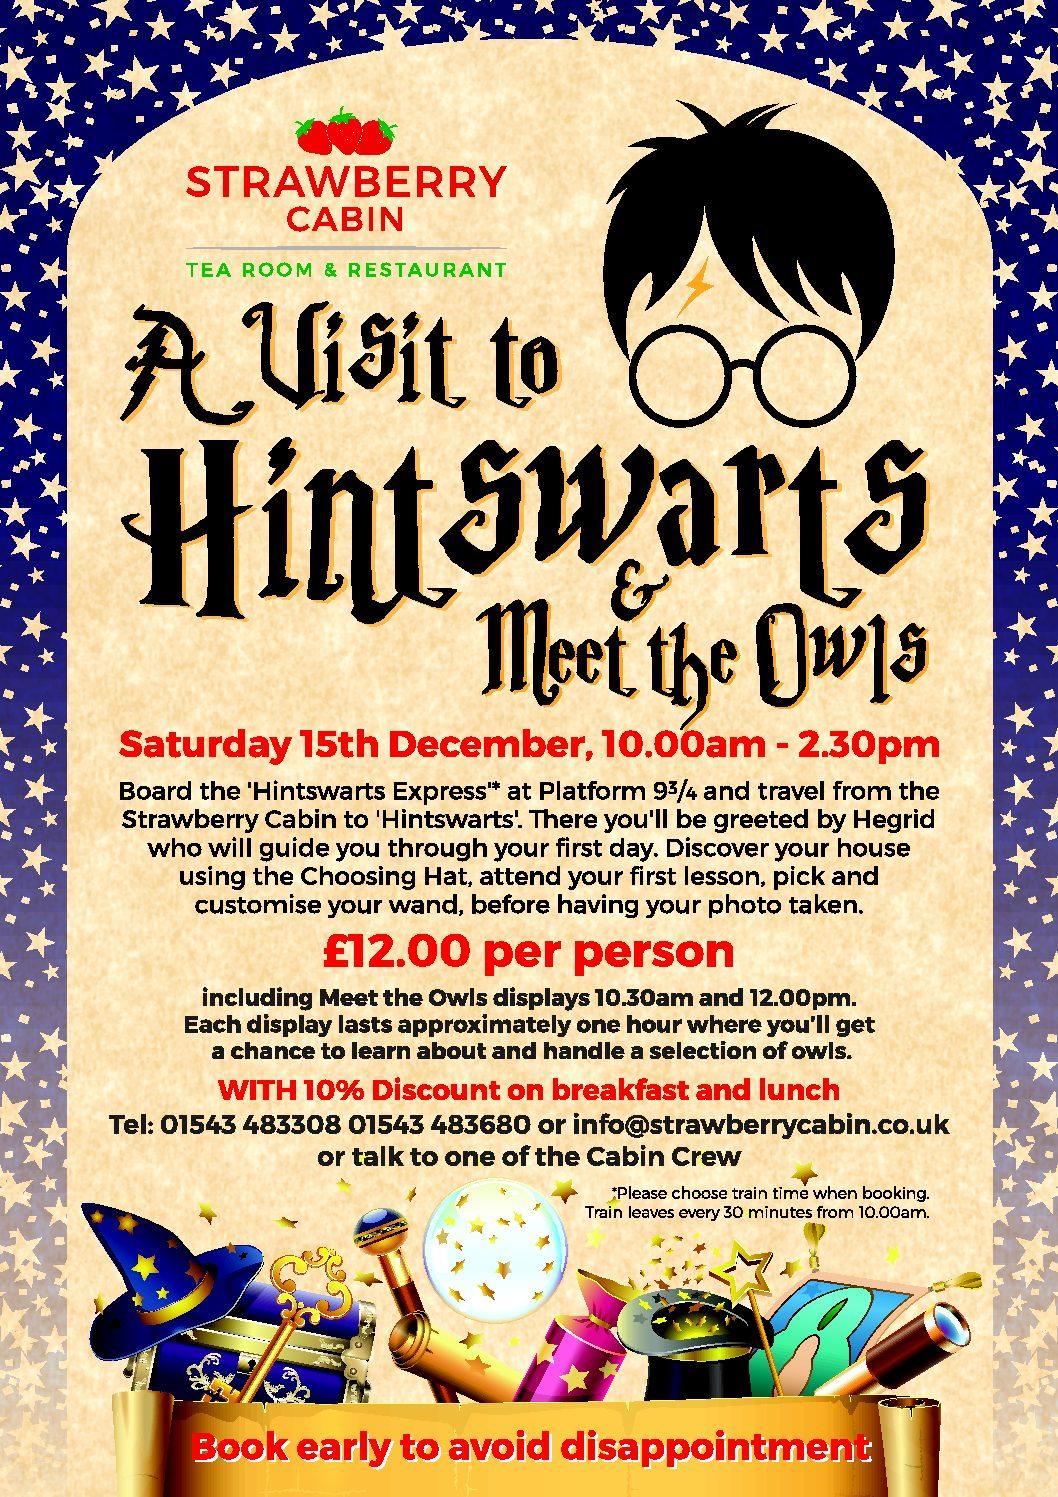 Hintswarts Saturday 15th December